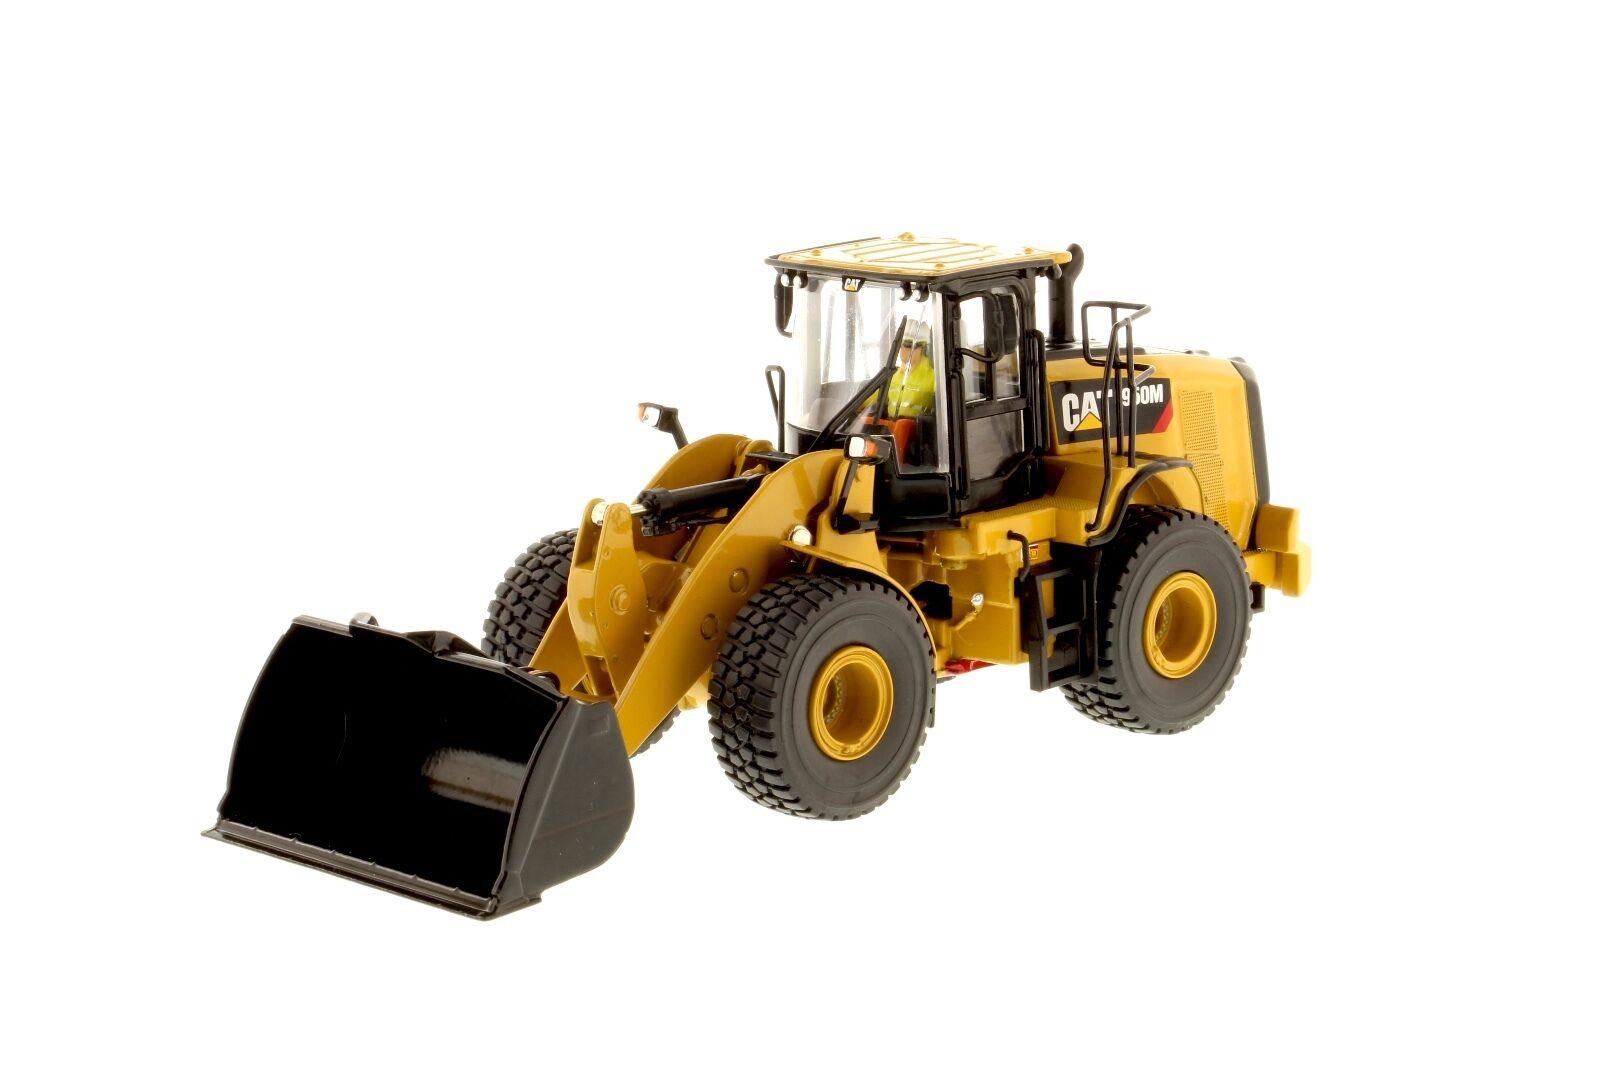 Caterpillar 1 50 scale Cat® 950M Wheel Loader 85914 Diecast Masters